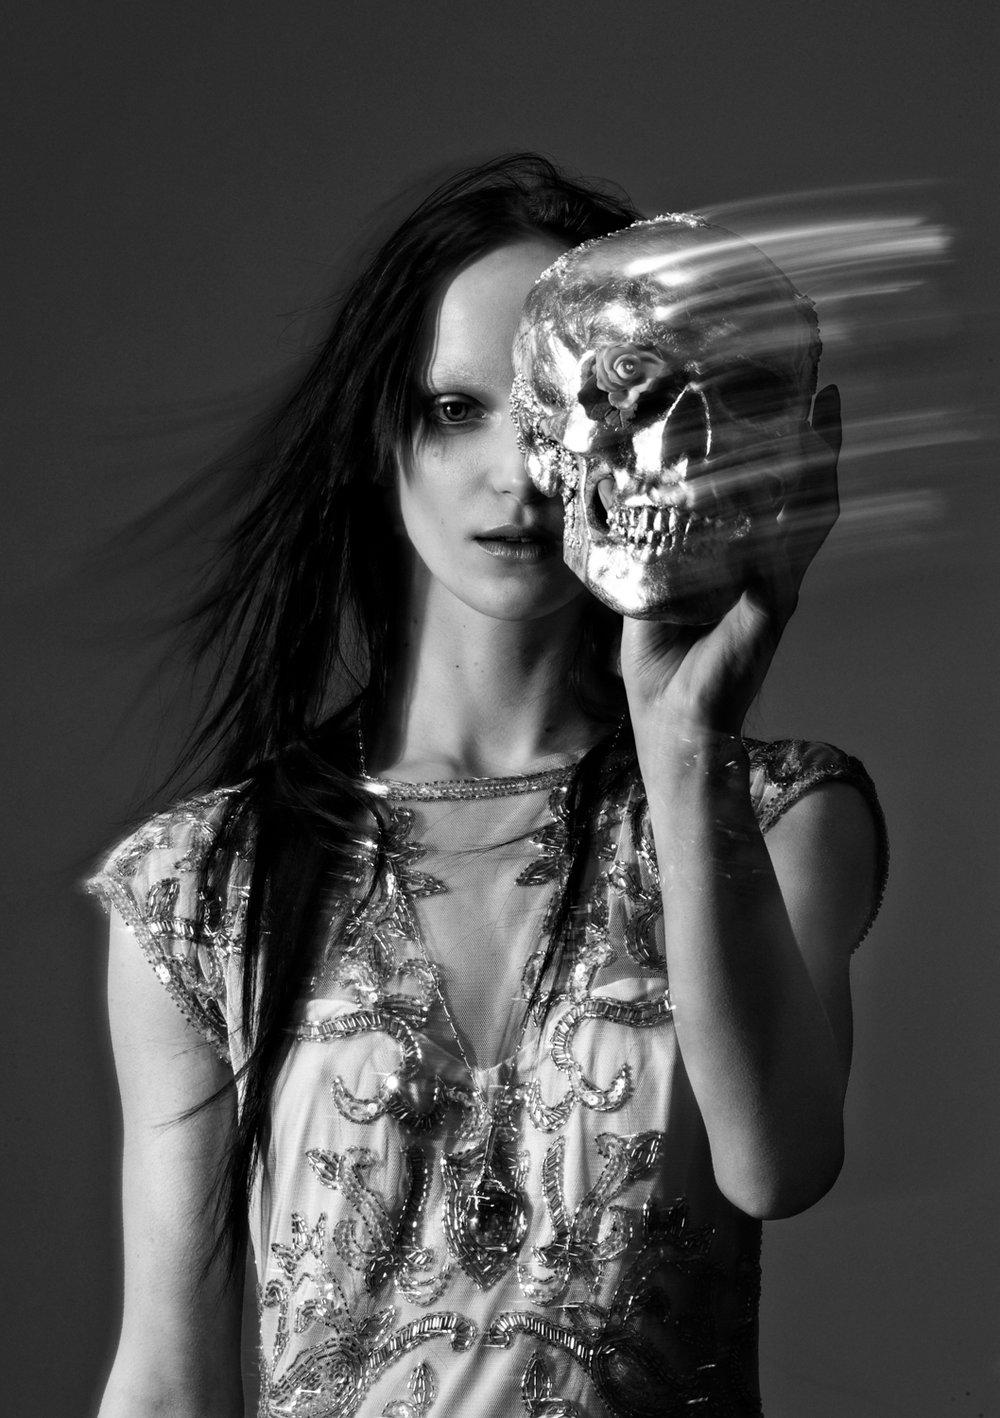 Follow Me by Jacqueline Puwalski